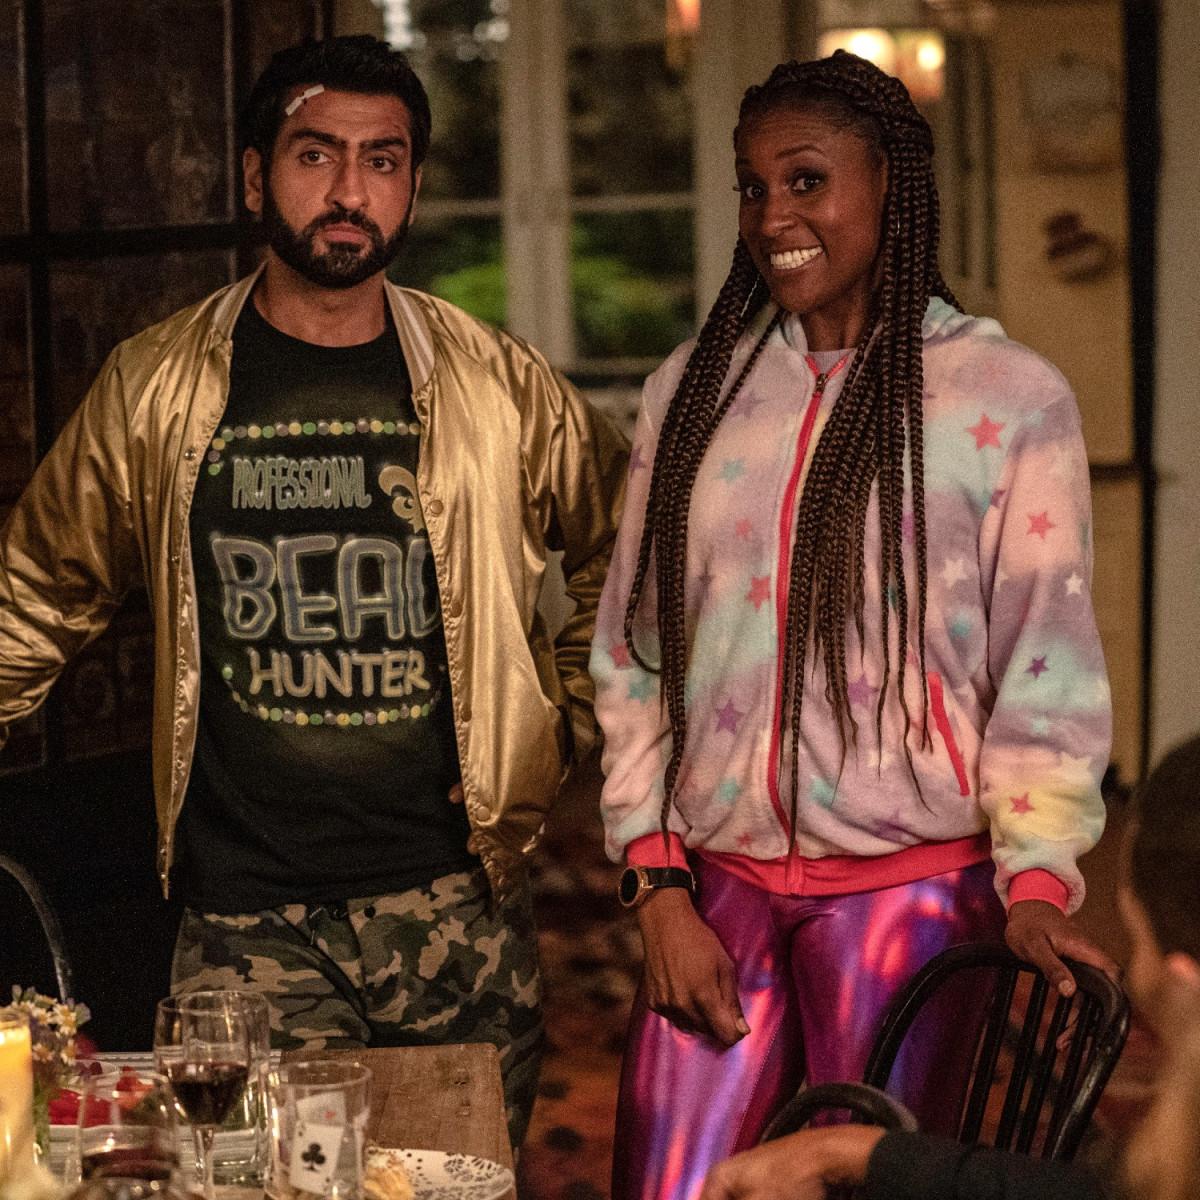 Kumail Nanjiani and Issa Rae in The Lovebirds